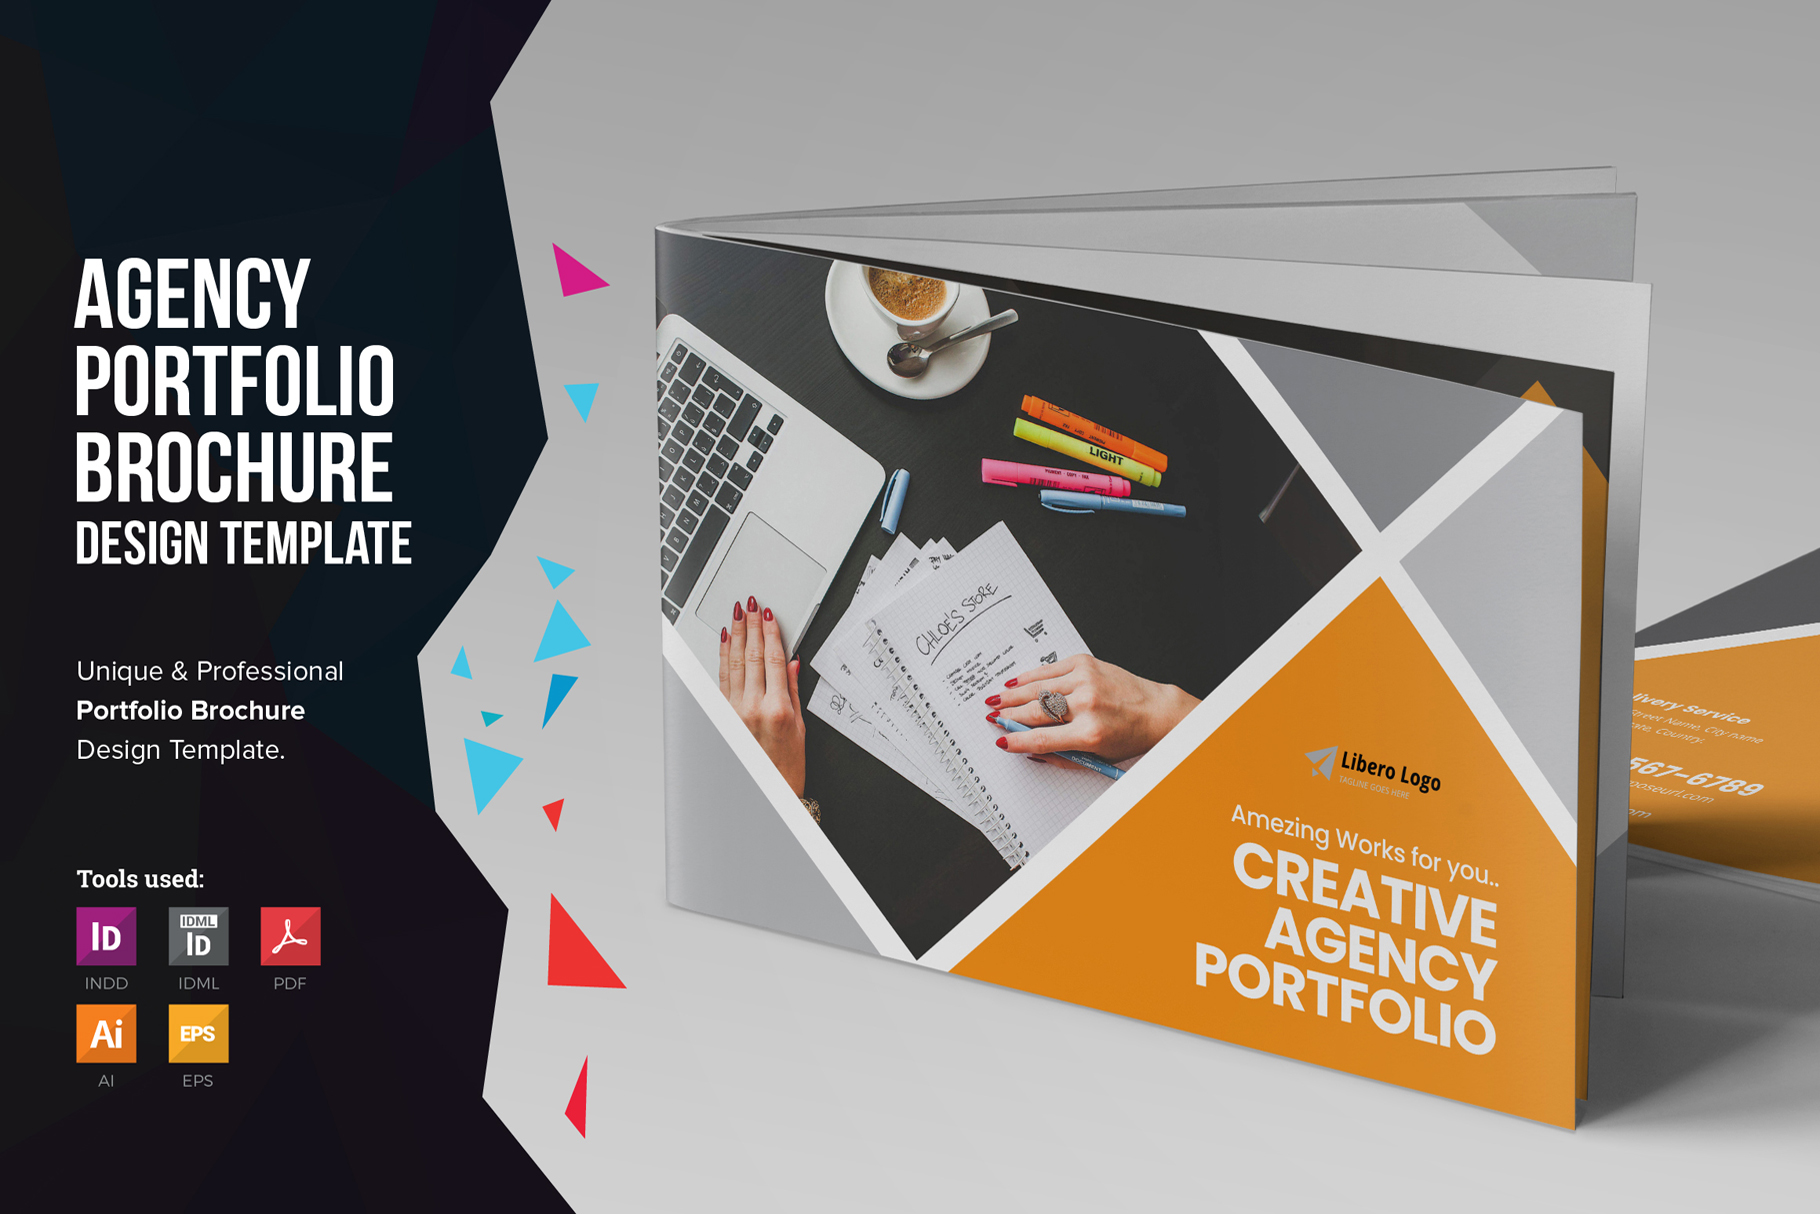 Digital Agency Portfolio Brochure v2 example image 1